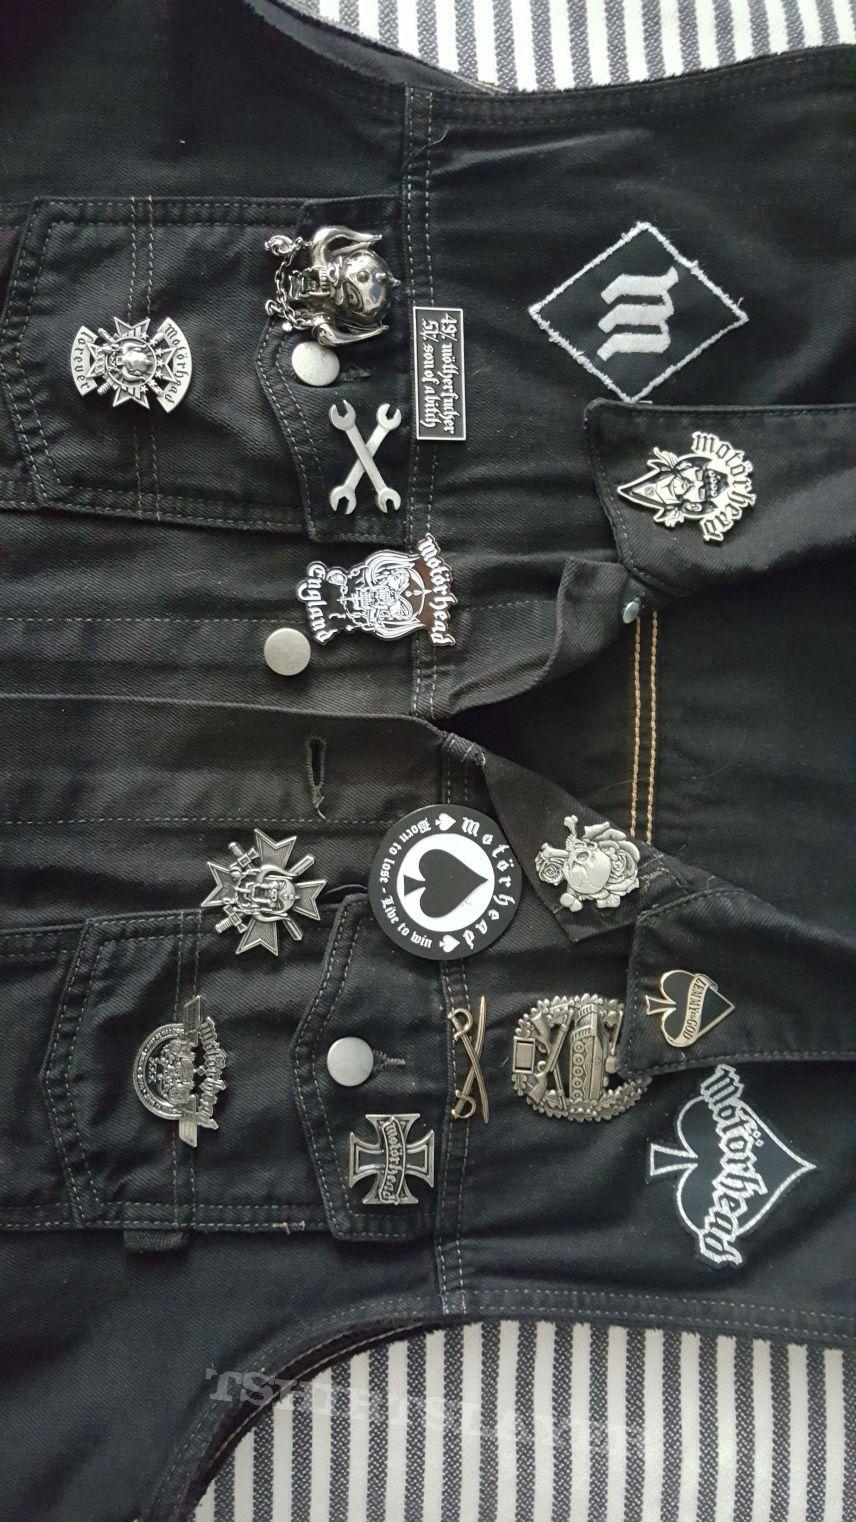 Motörhead - Motörcycle Kutte update